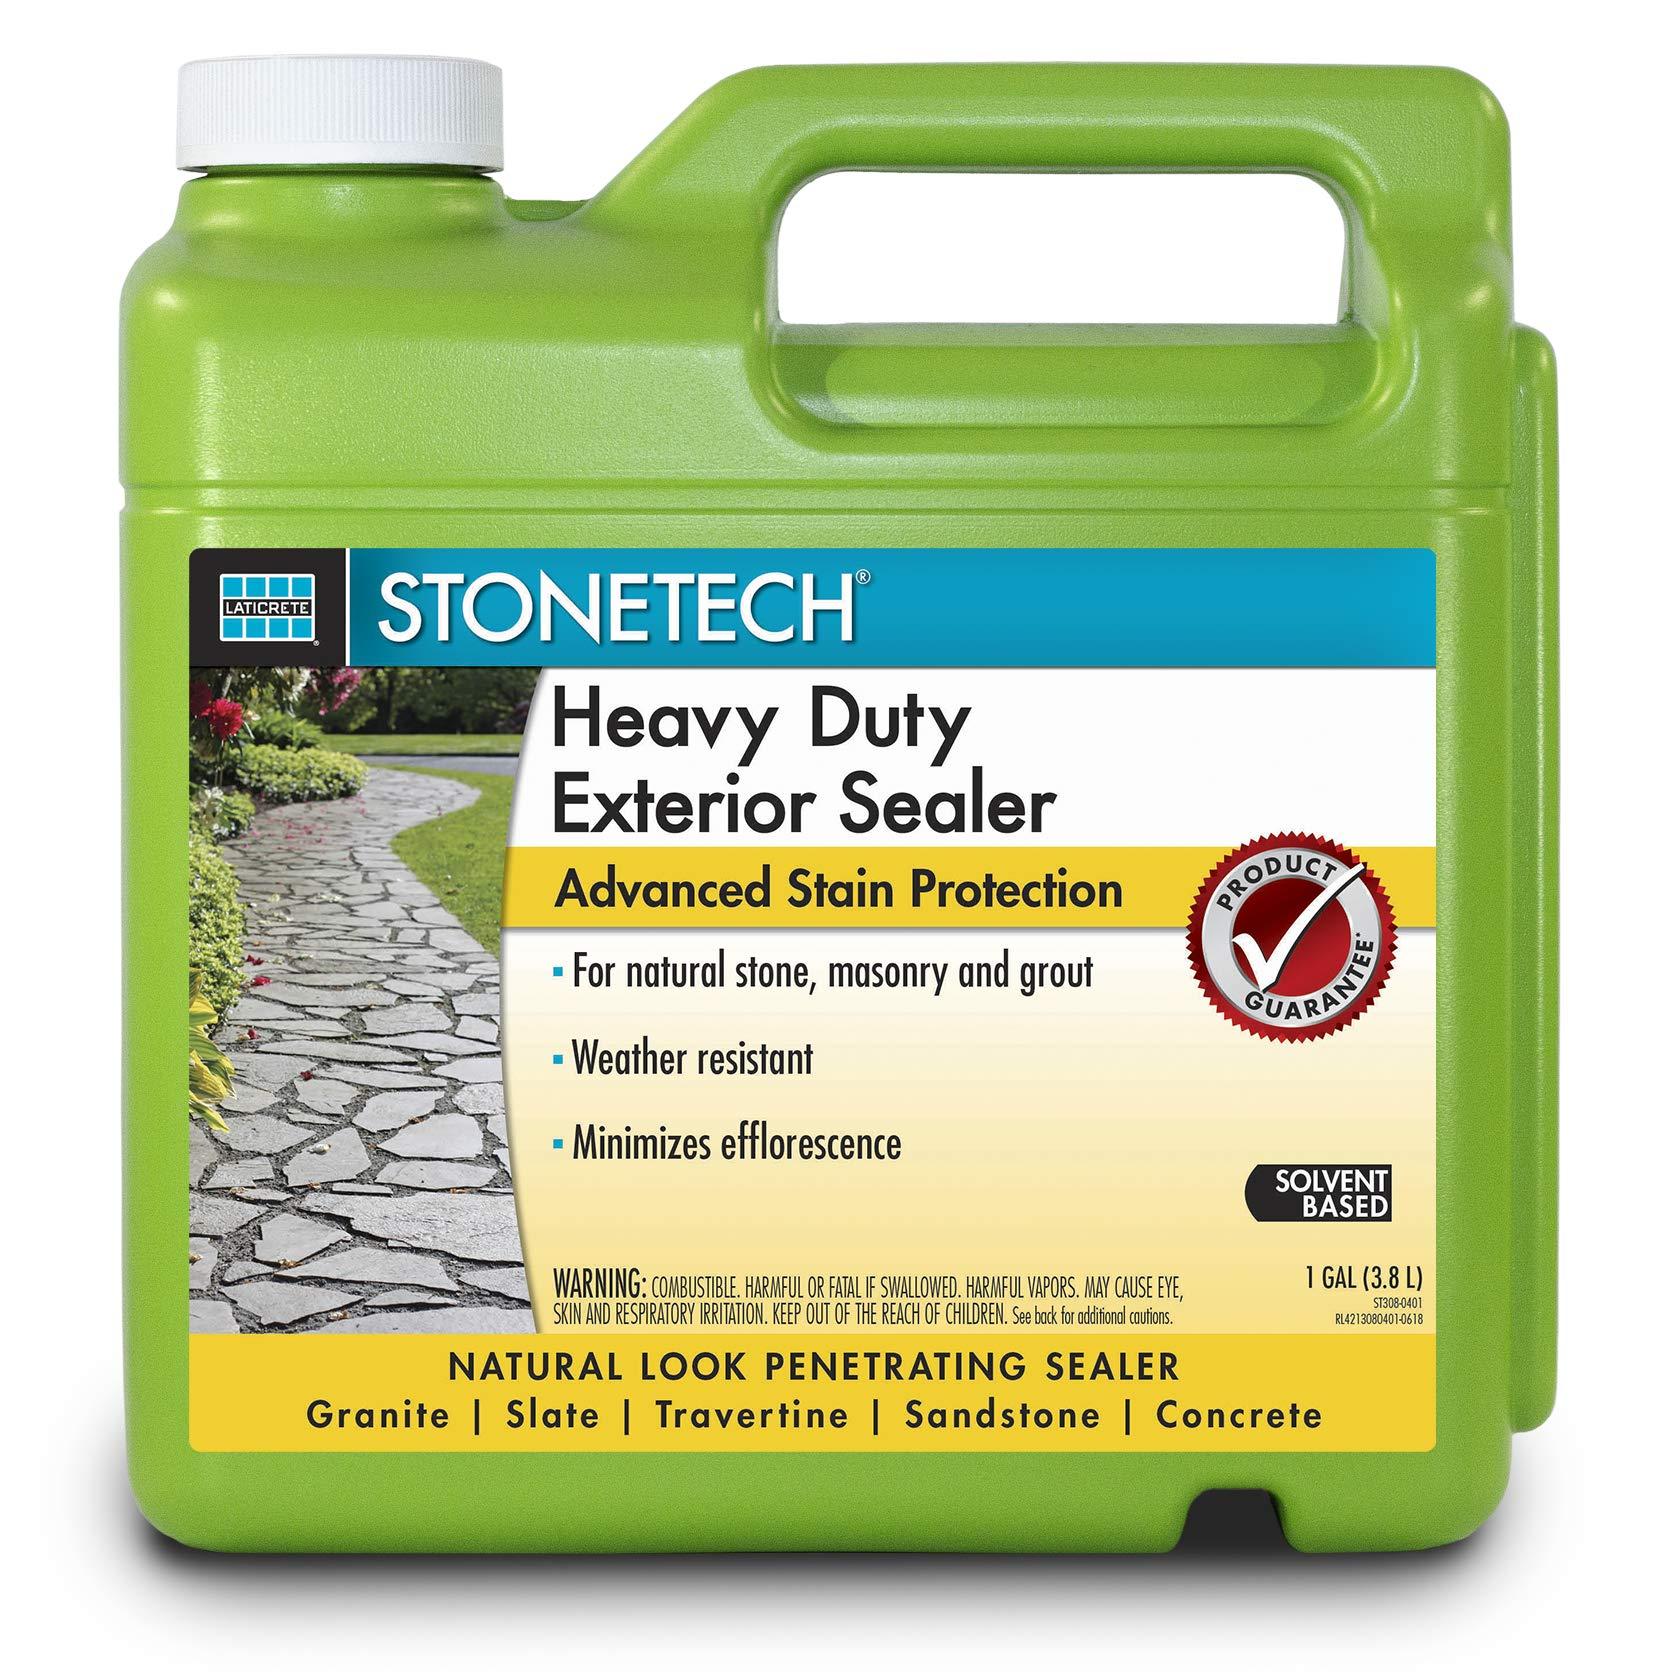 Lataicrete StoneTech Professional Solvent-Based Heavy Duty Exterior Sealer - 1 Gallon by StoneTech